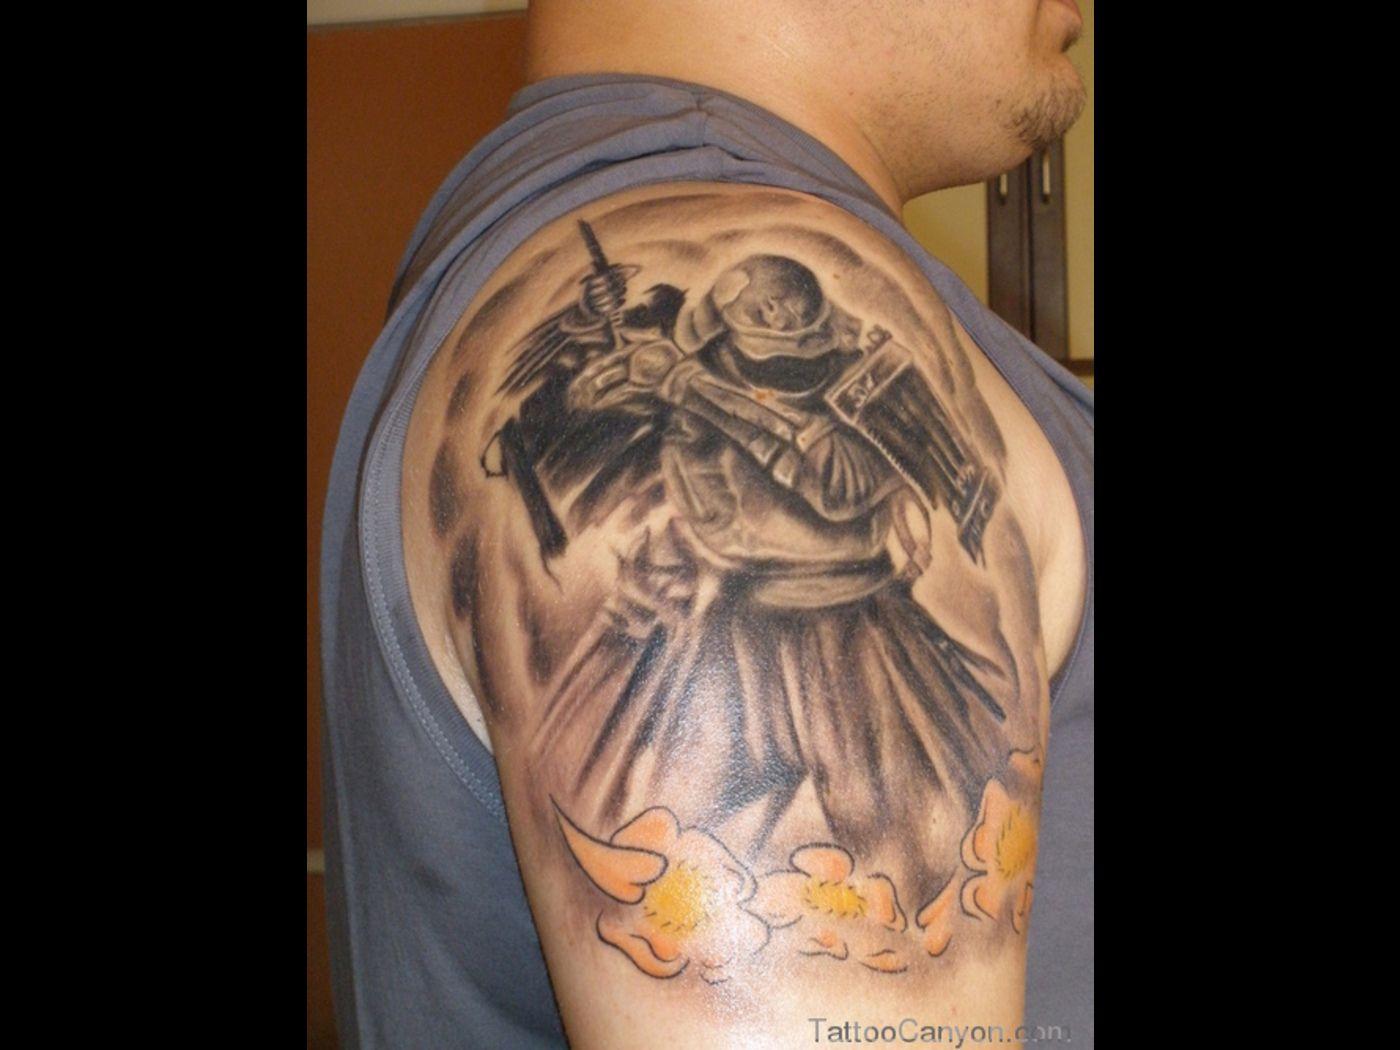 Samurai tattoo designs japanese tattoos art free download tattoo design ideas design http